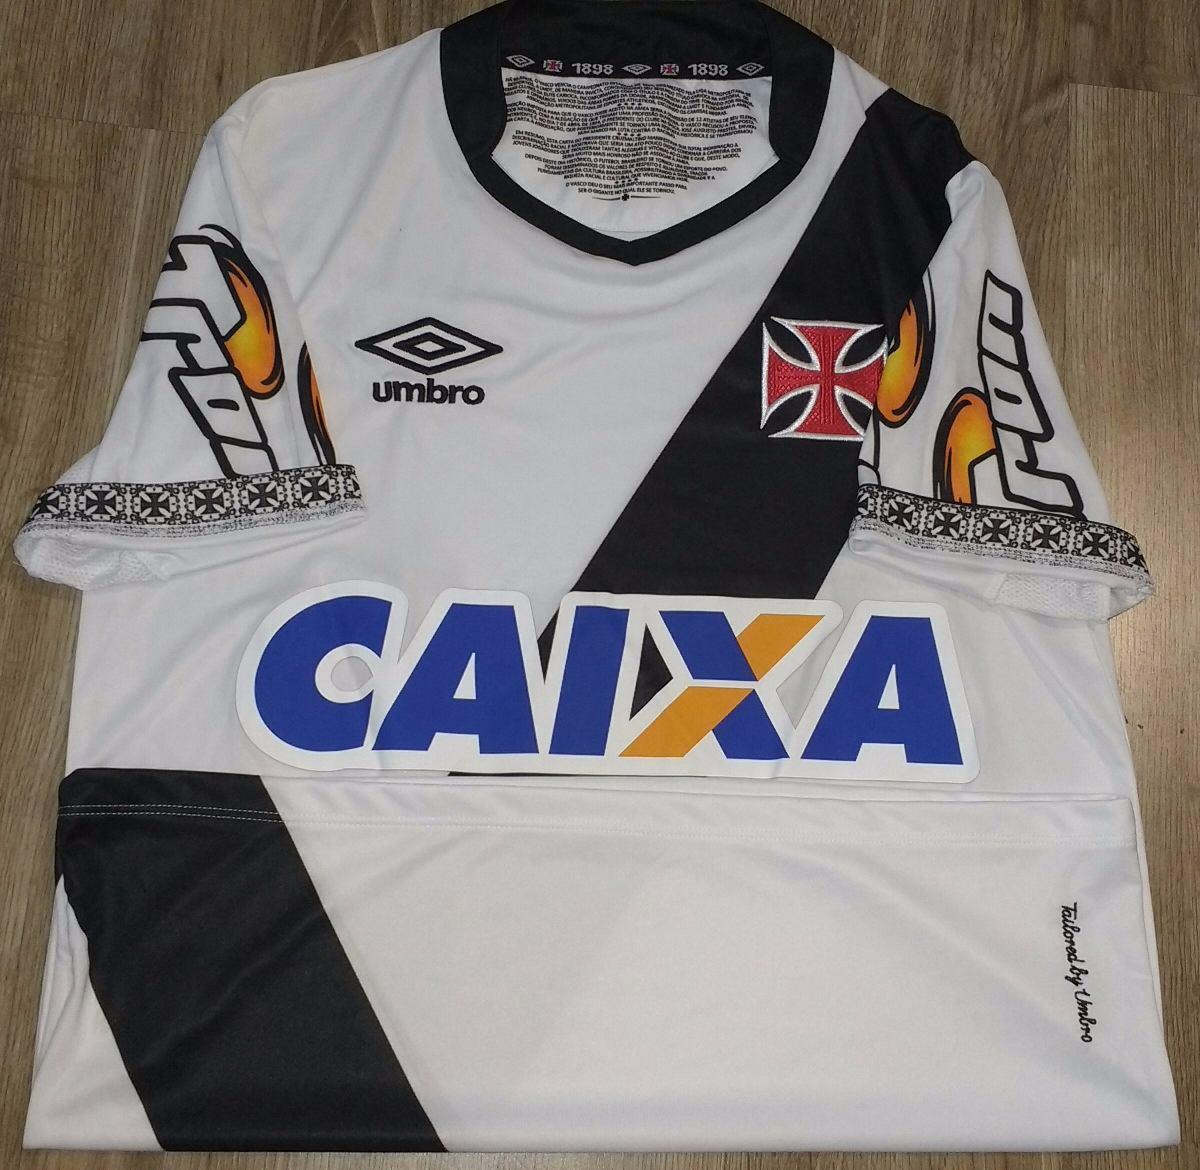 camisa vasco 2014 umbro original campanha anti racismo - 99. Carregando zoom . b1f81c436bde1